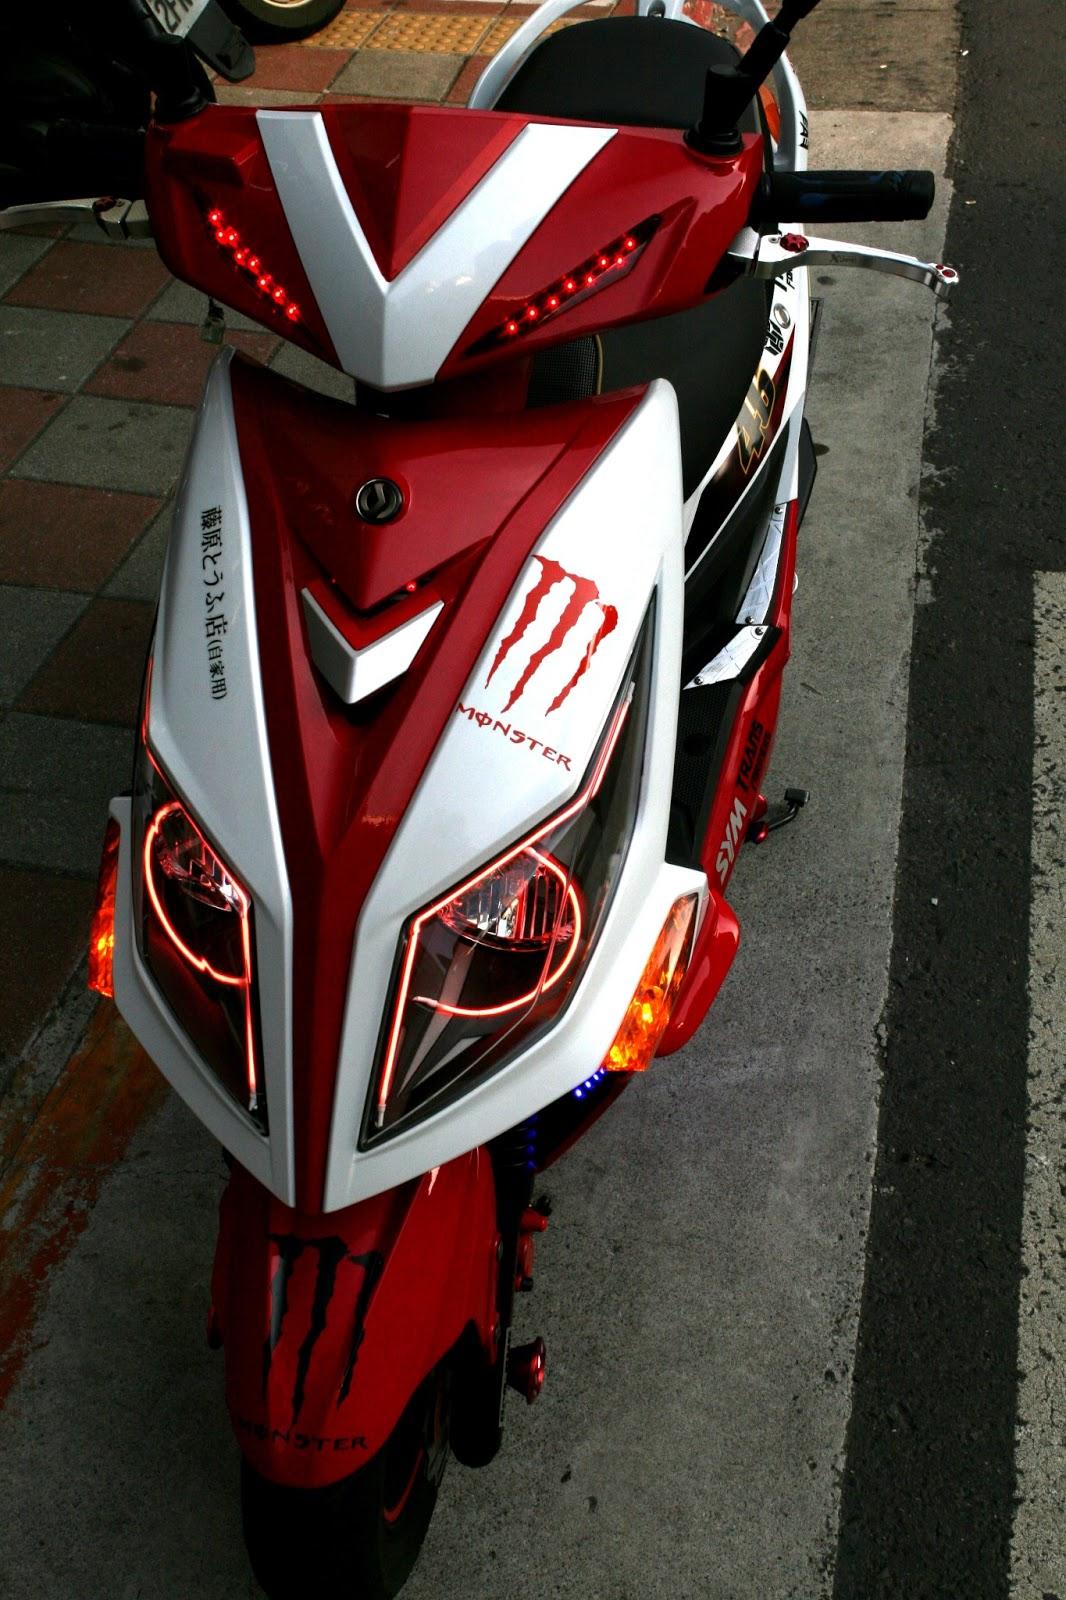 Taipei-Scooter-Style.com 台北摩托車風格: February 2013